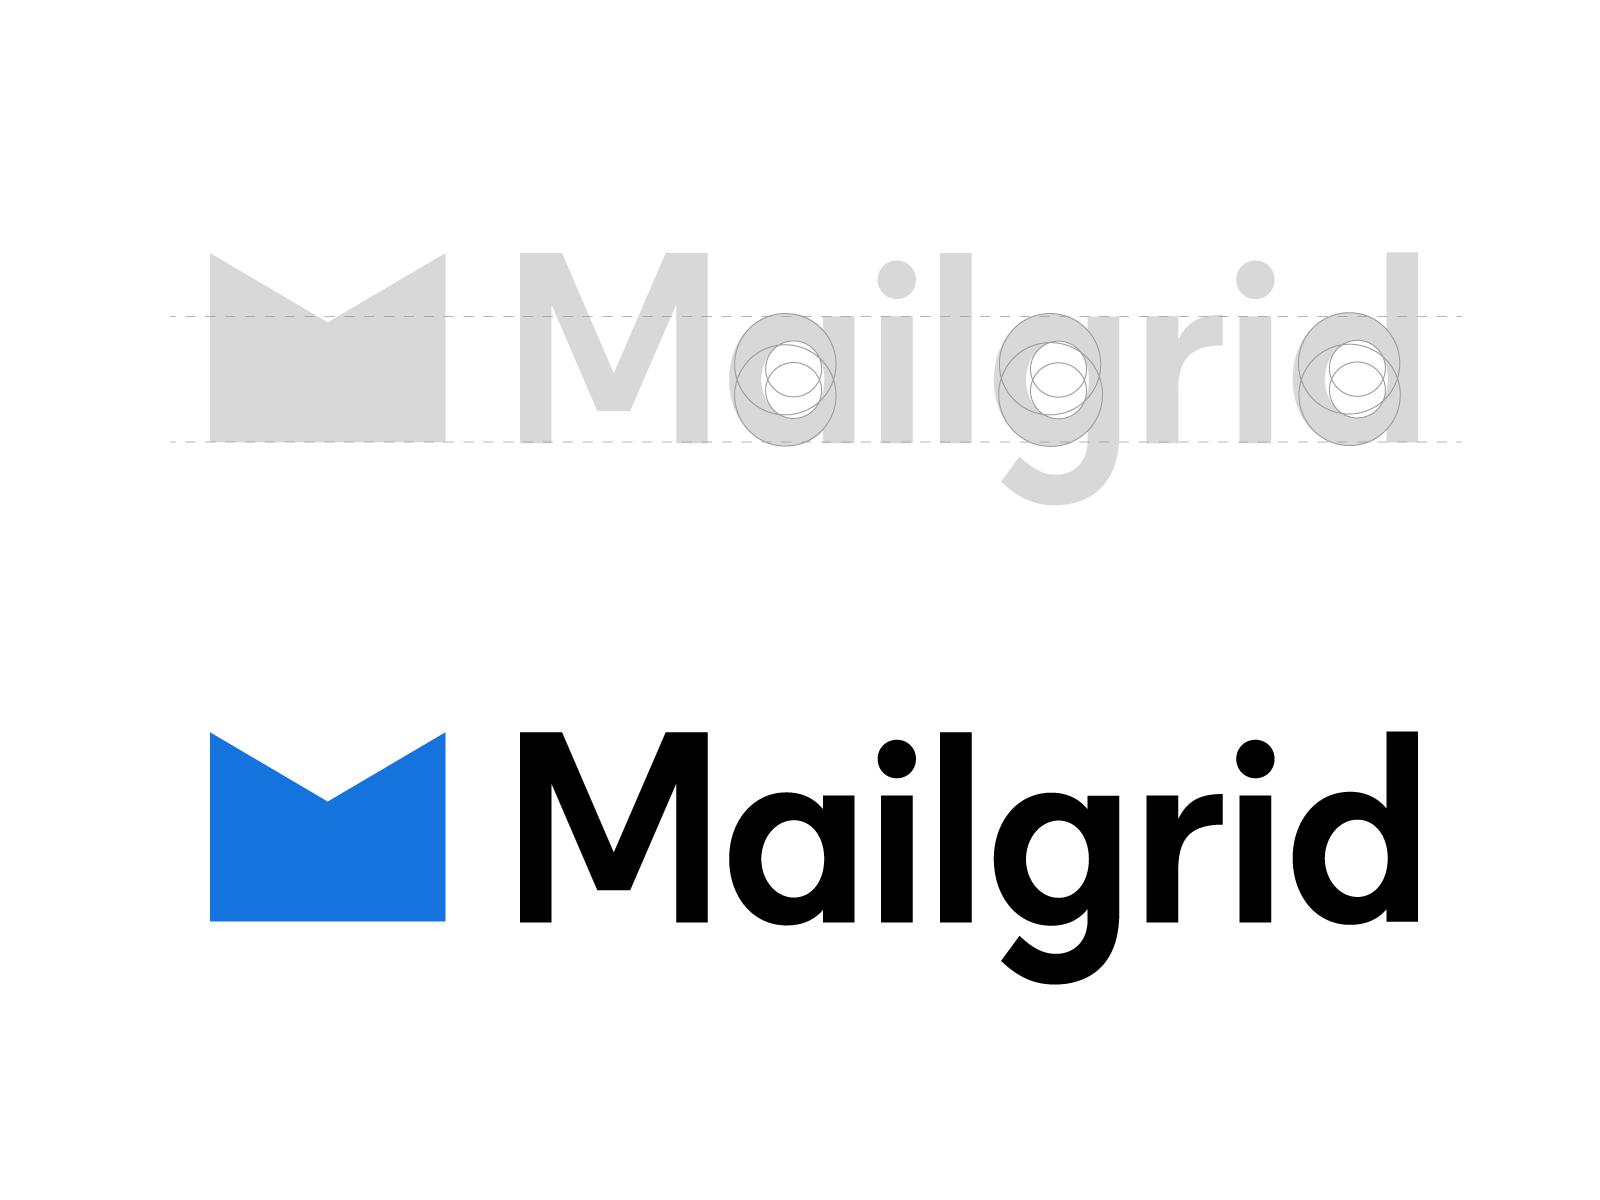 Mailgrid new logo